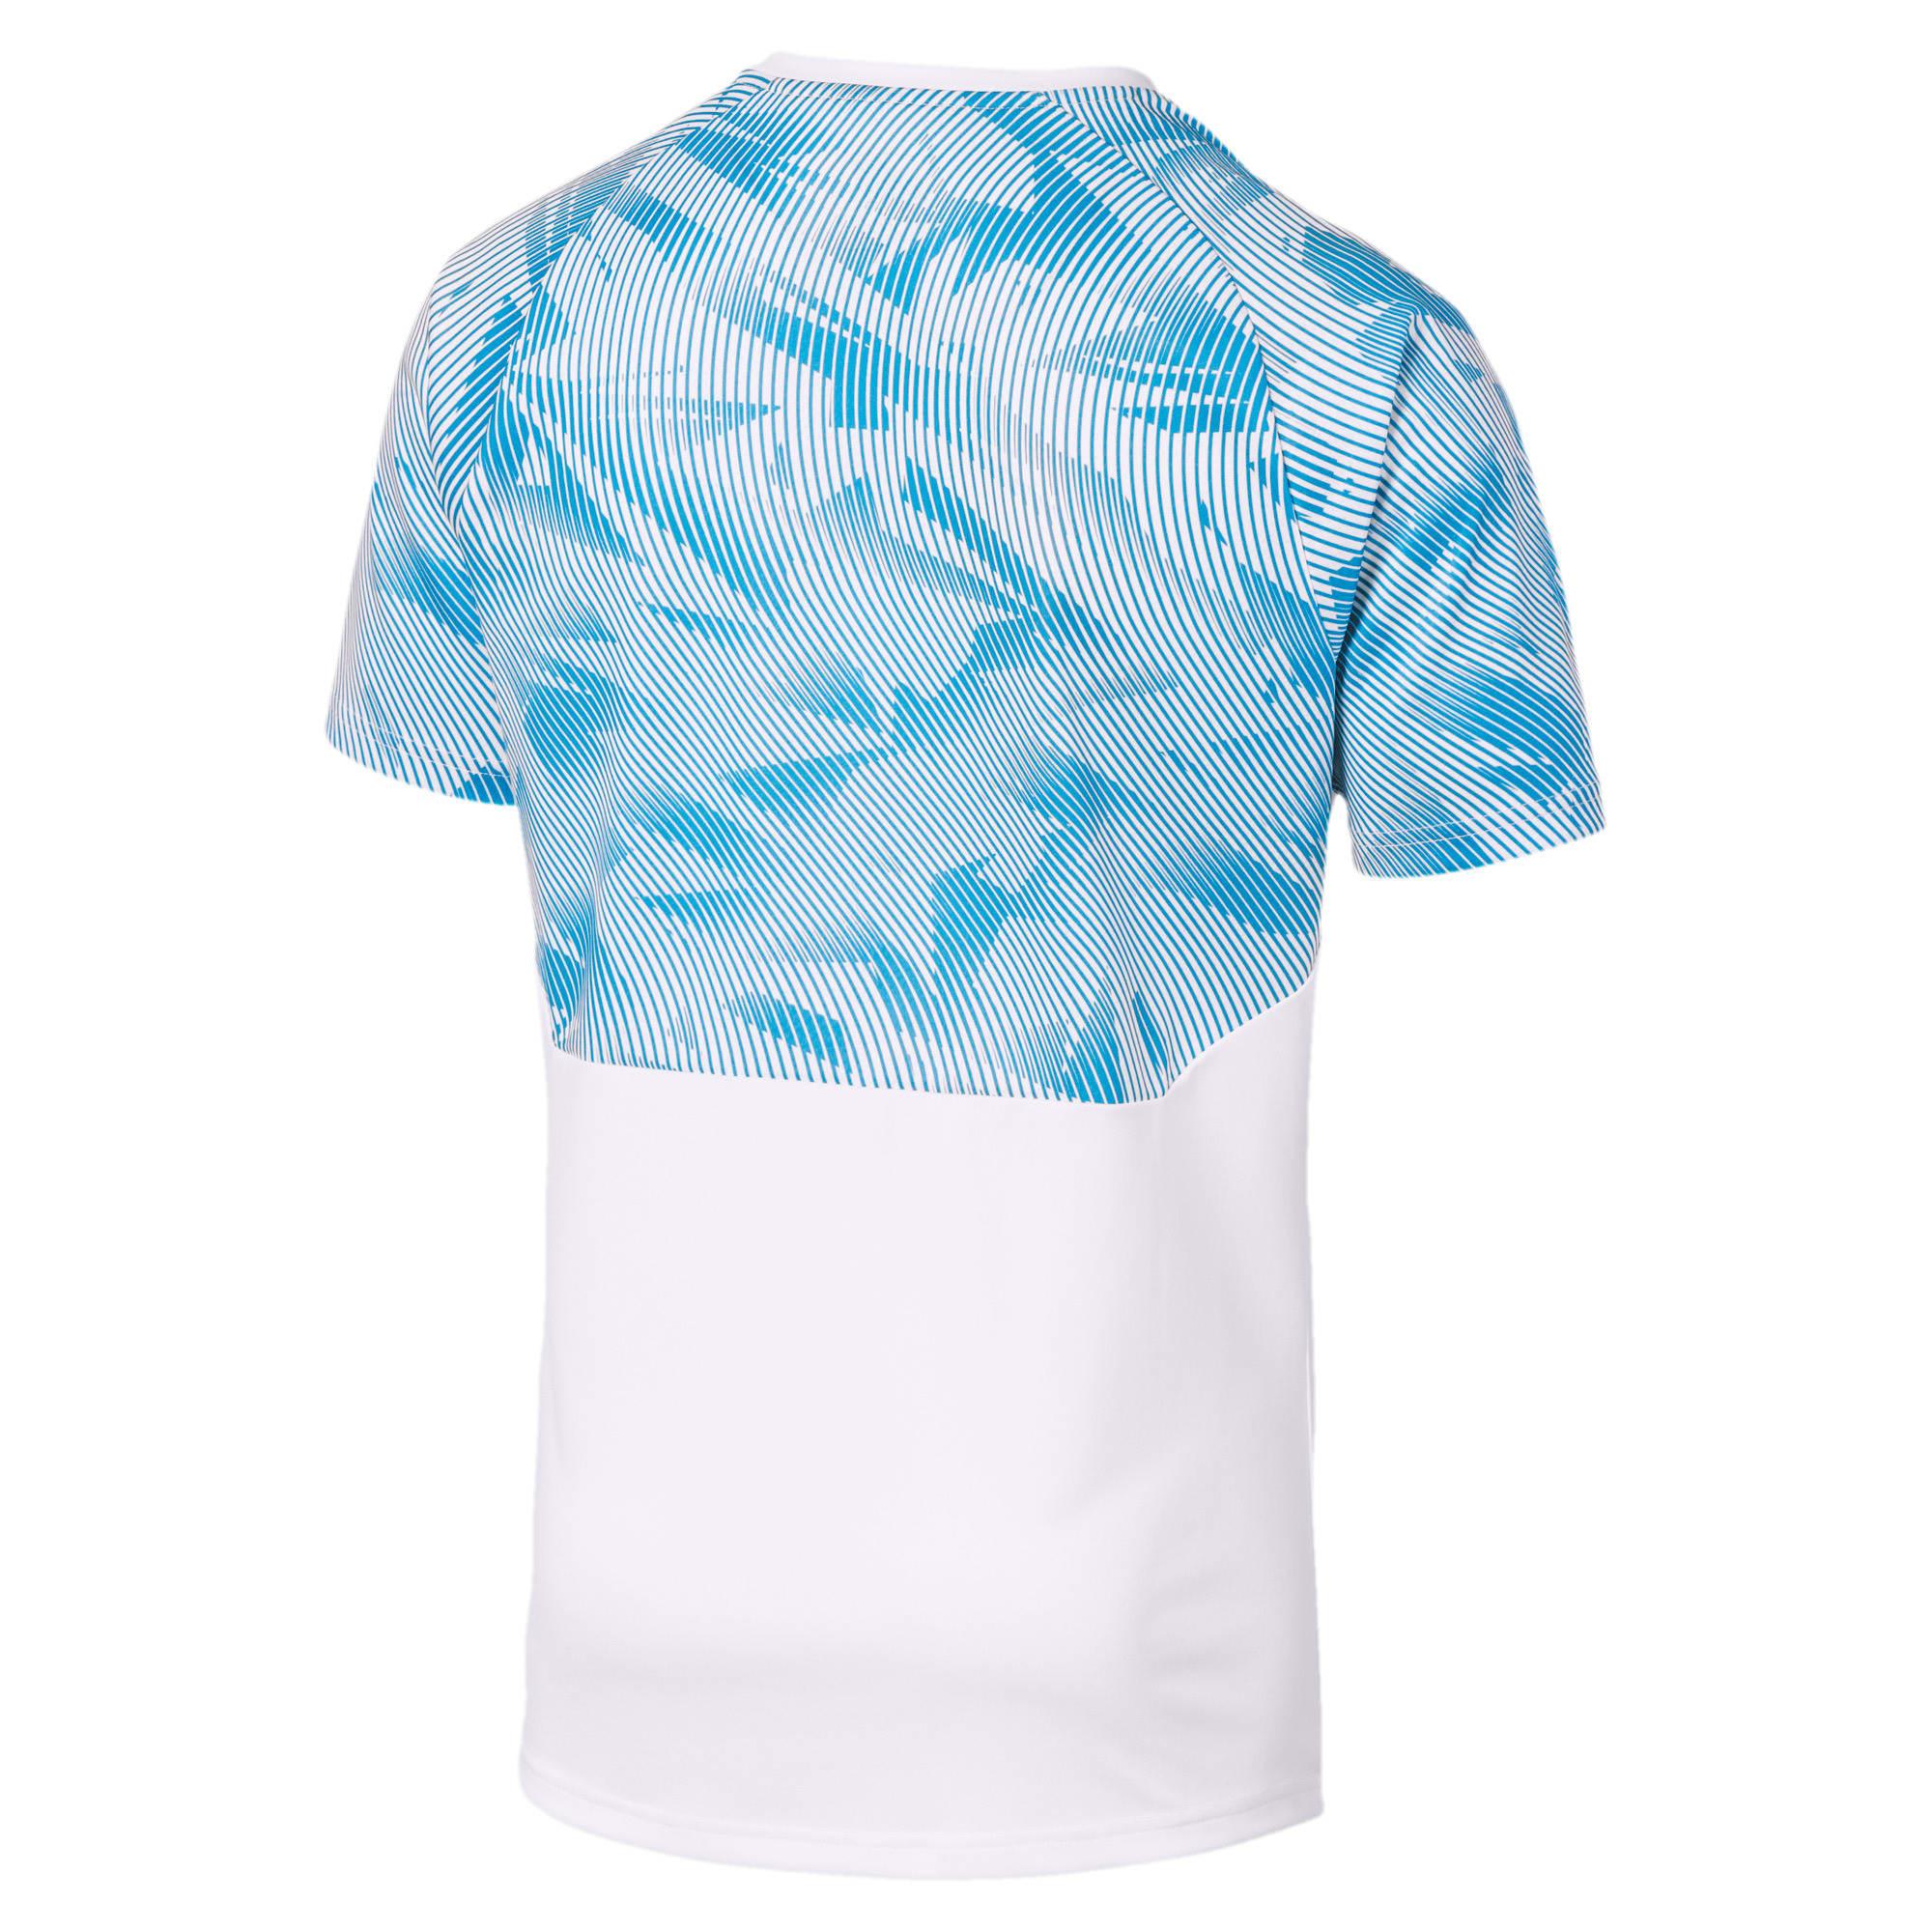 Thumbnail 5 of Olympique de Marseille Herren Trainingstrikot, Puma White-Bleu Azur, medium